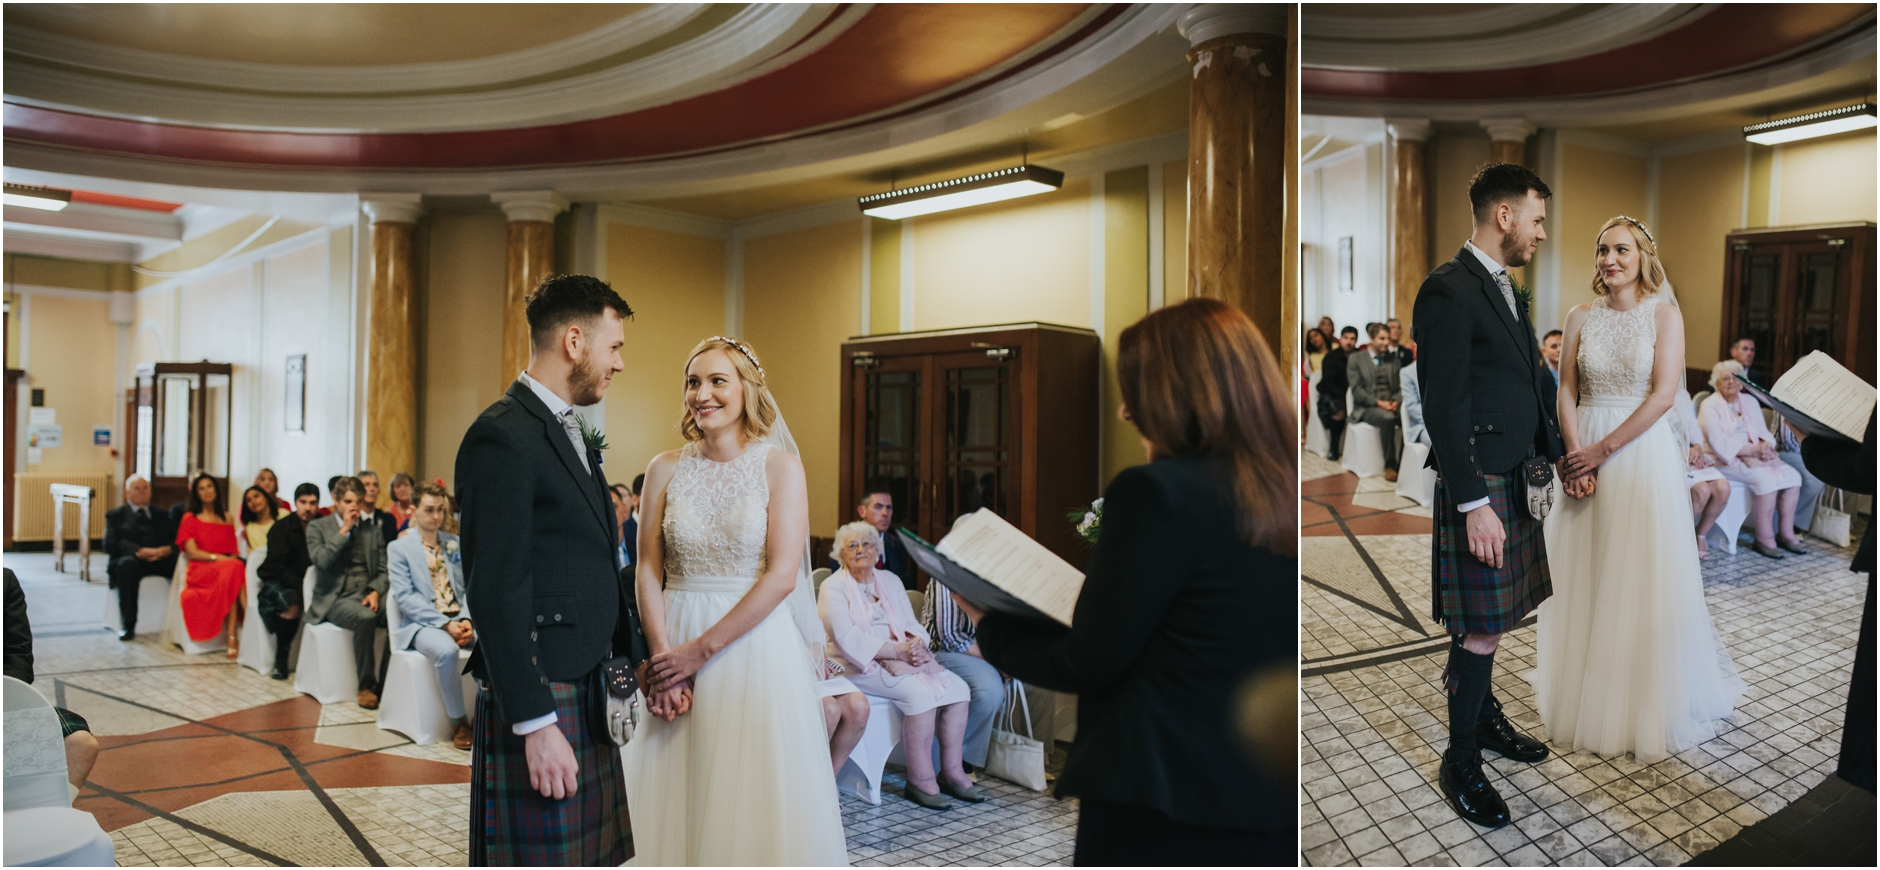 humanist wedding ceremony thomas morton hall leith theatre